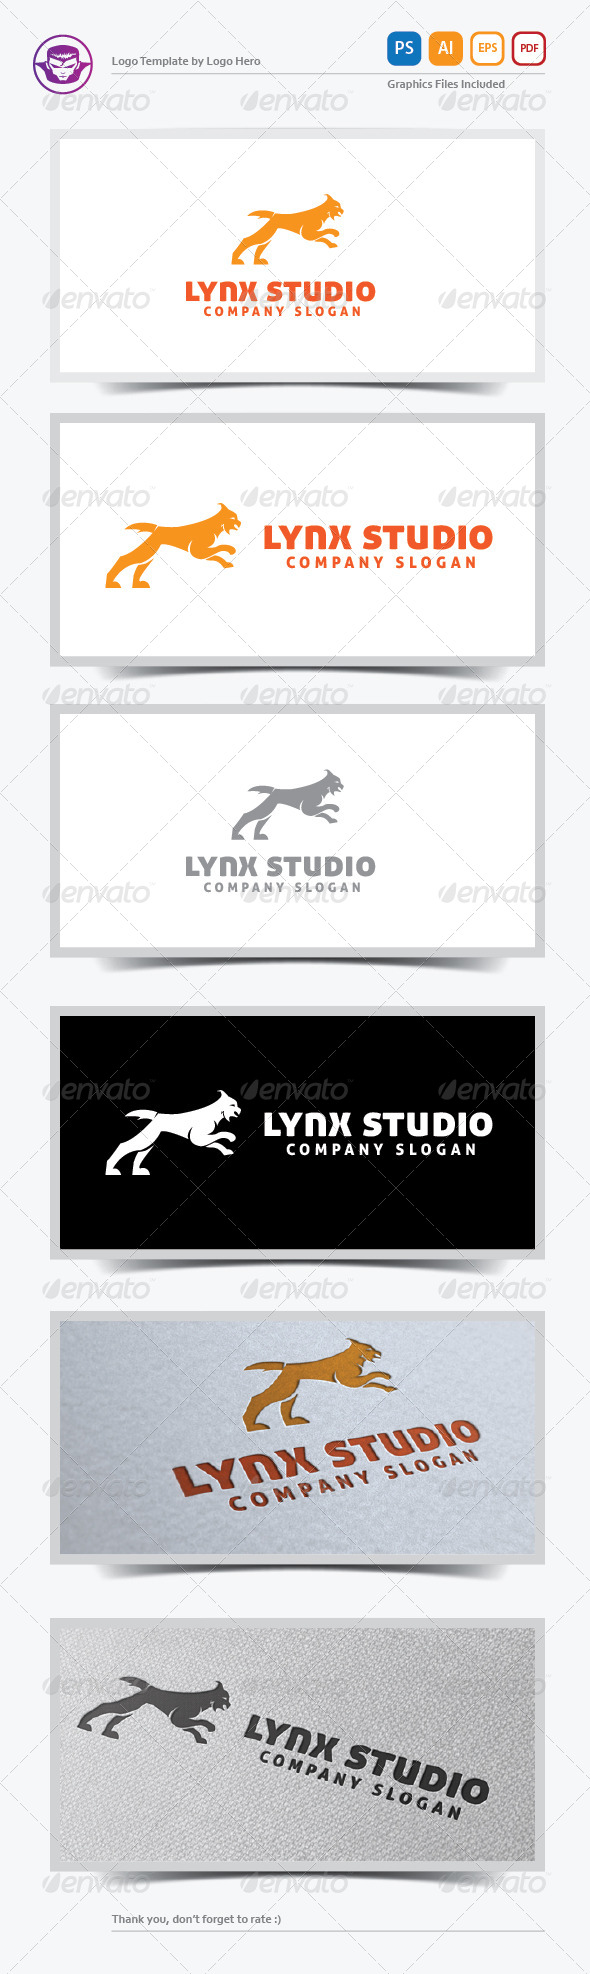 GraphicRiver Lynx Studio Logo Template 5697686